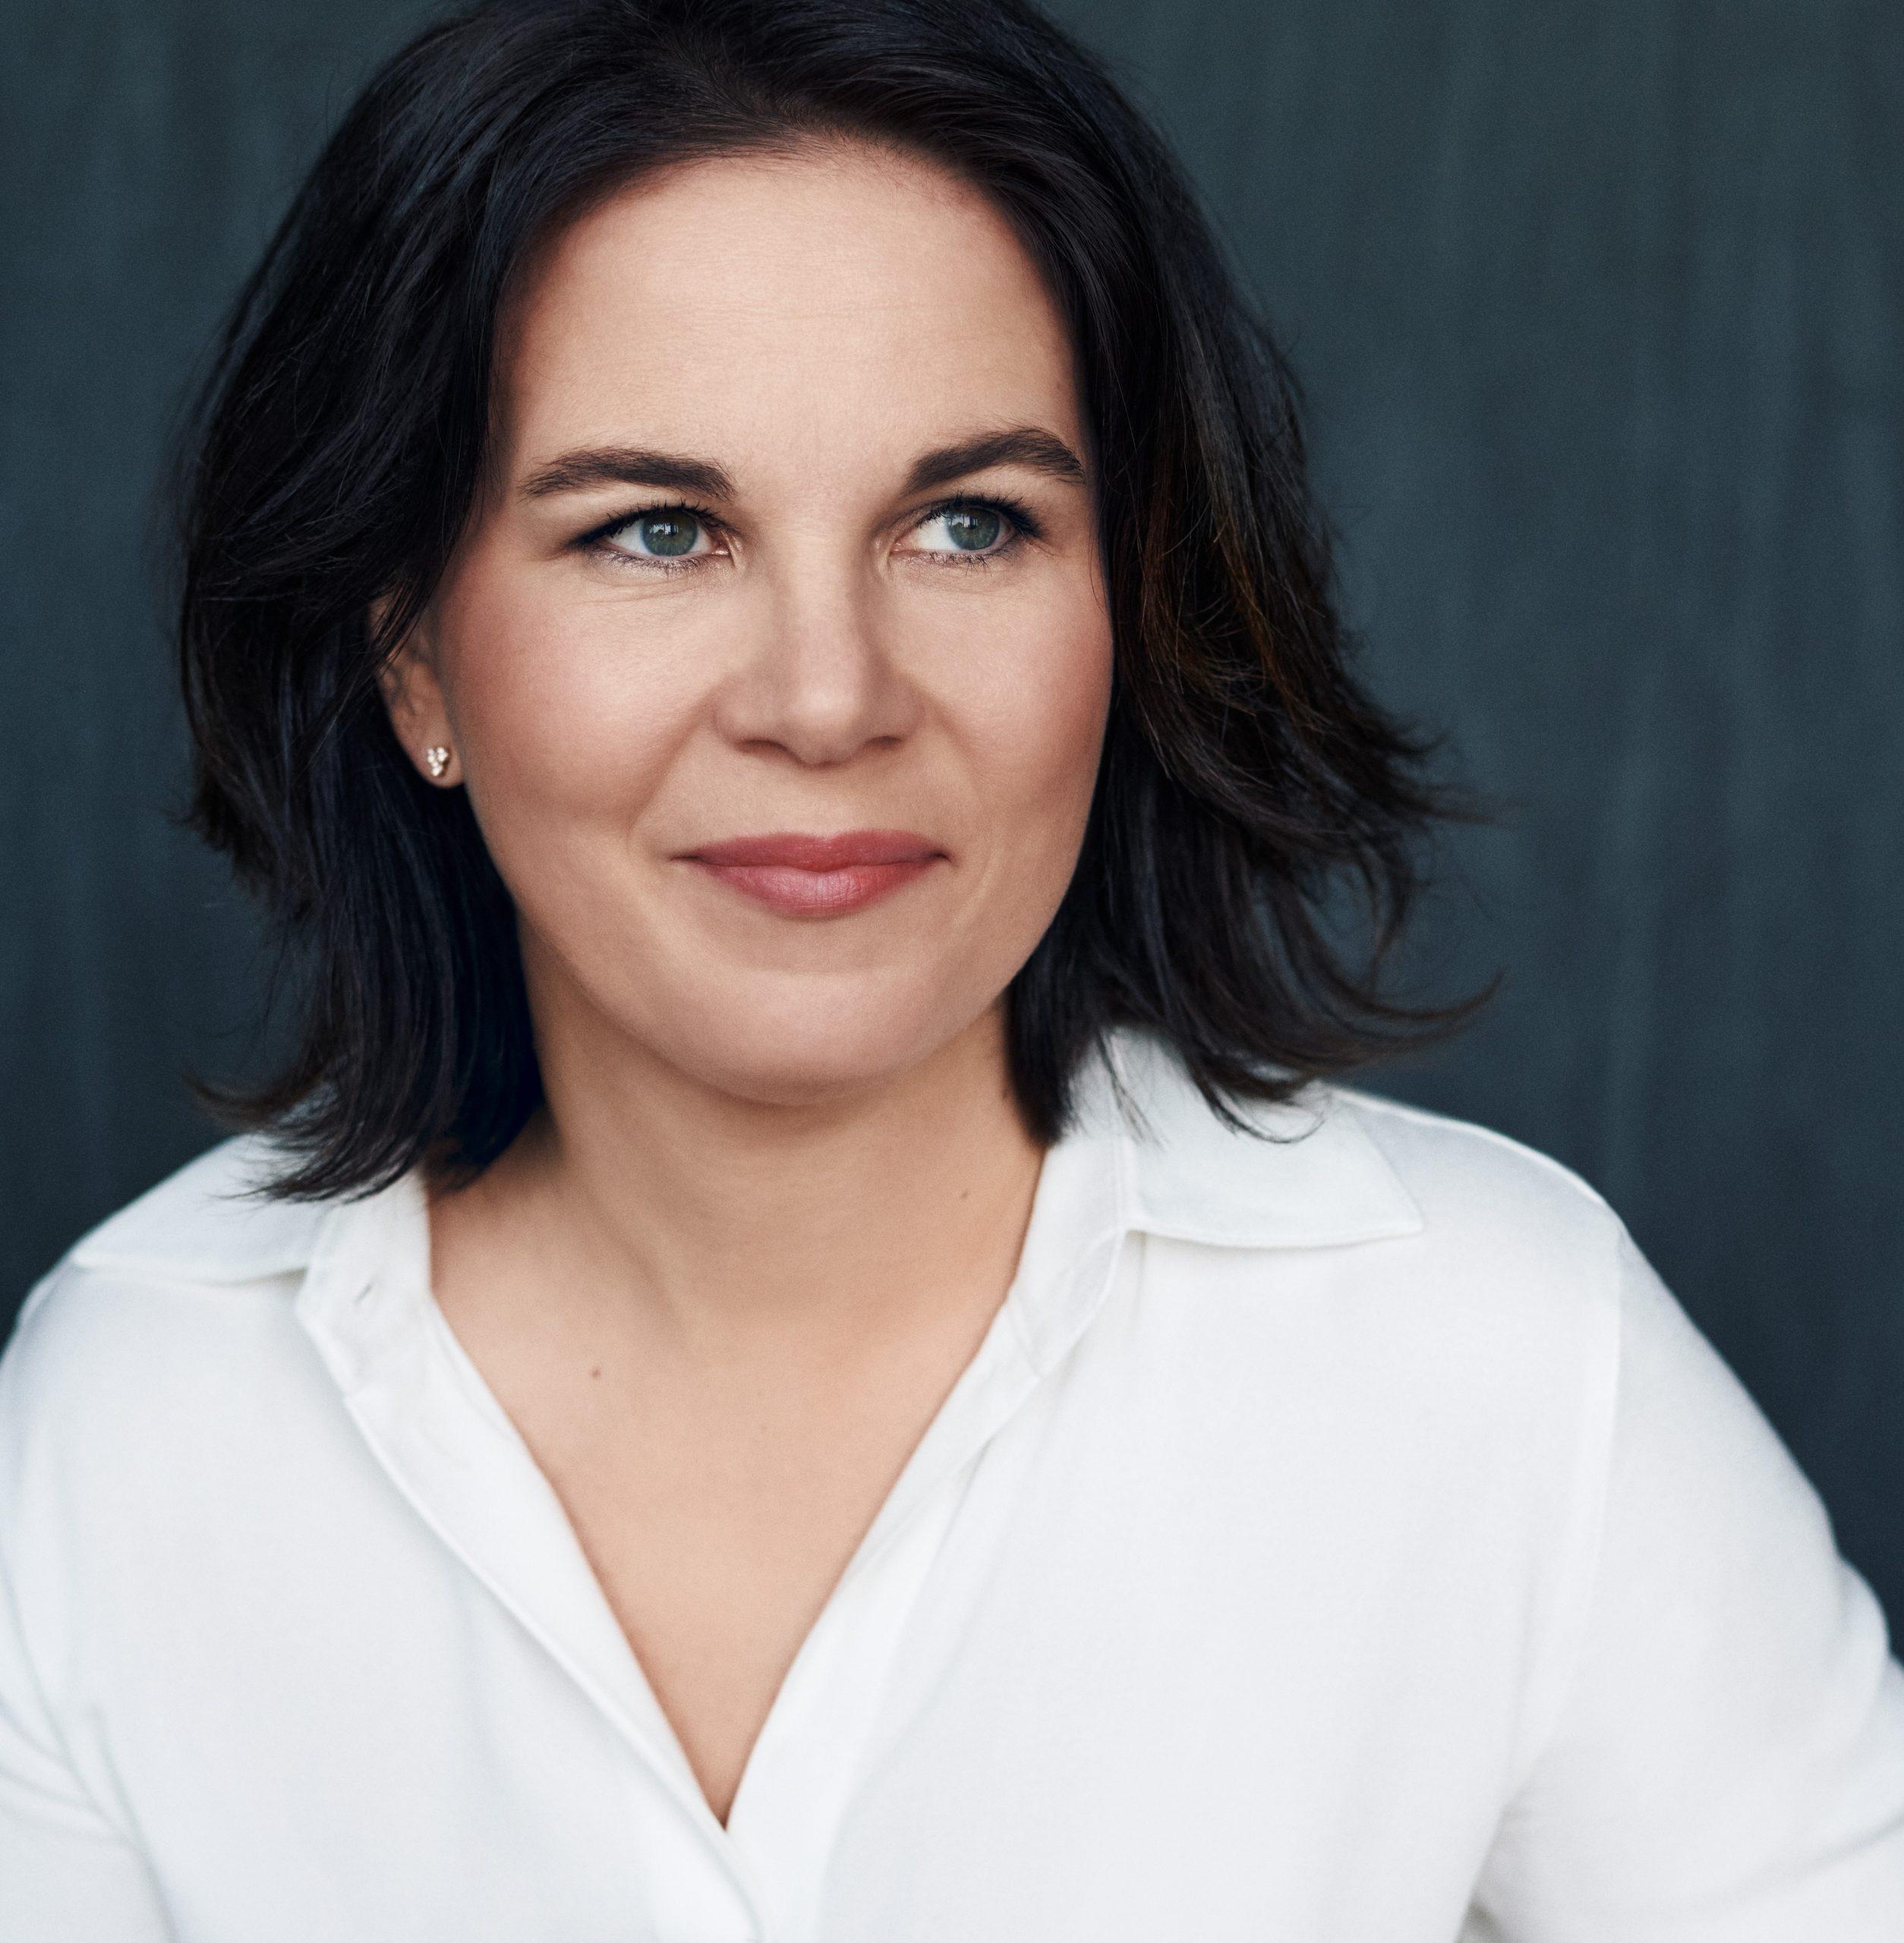 Unsere Kanzlerinnenkandidatin: Annalena Baerbock